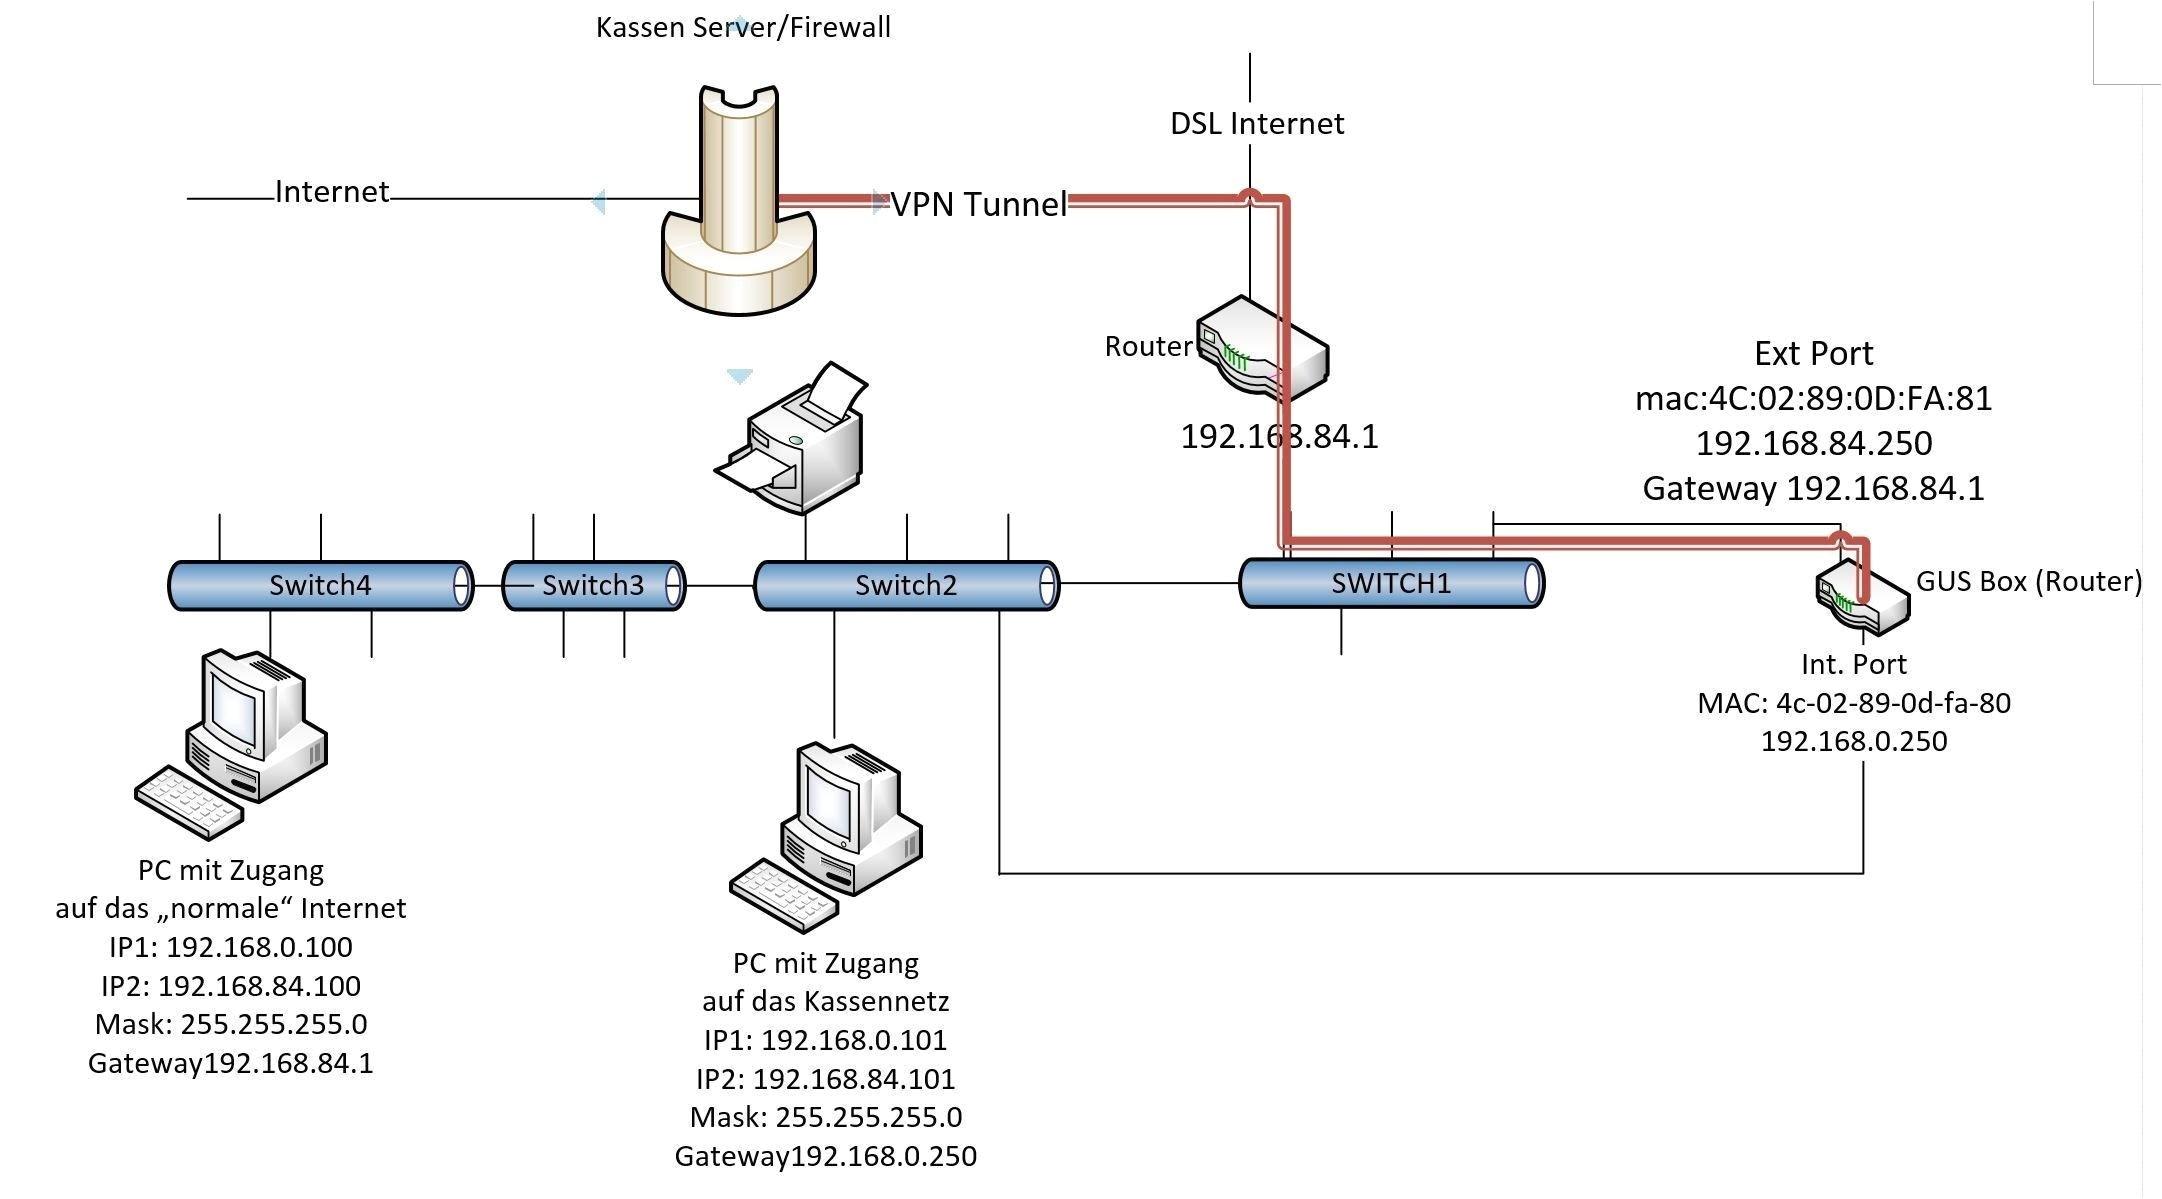 wiring diagram de walt dw306 wiring diagrams show wiring diagram de walt dw306